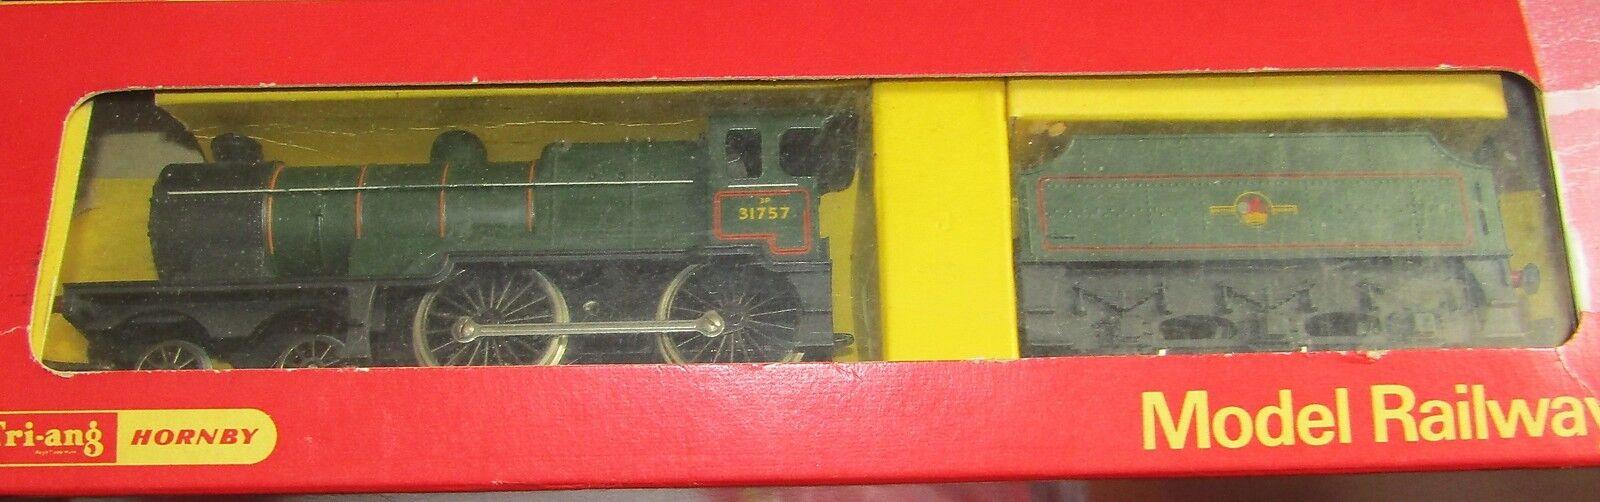 TRIANG HORNBY R350 SR CLASS L1 4-4-0 + TENDER BOXED  OO GAUGE